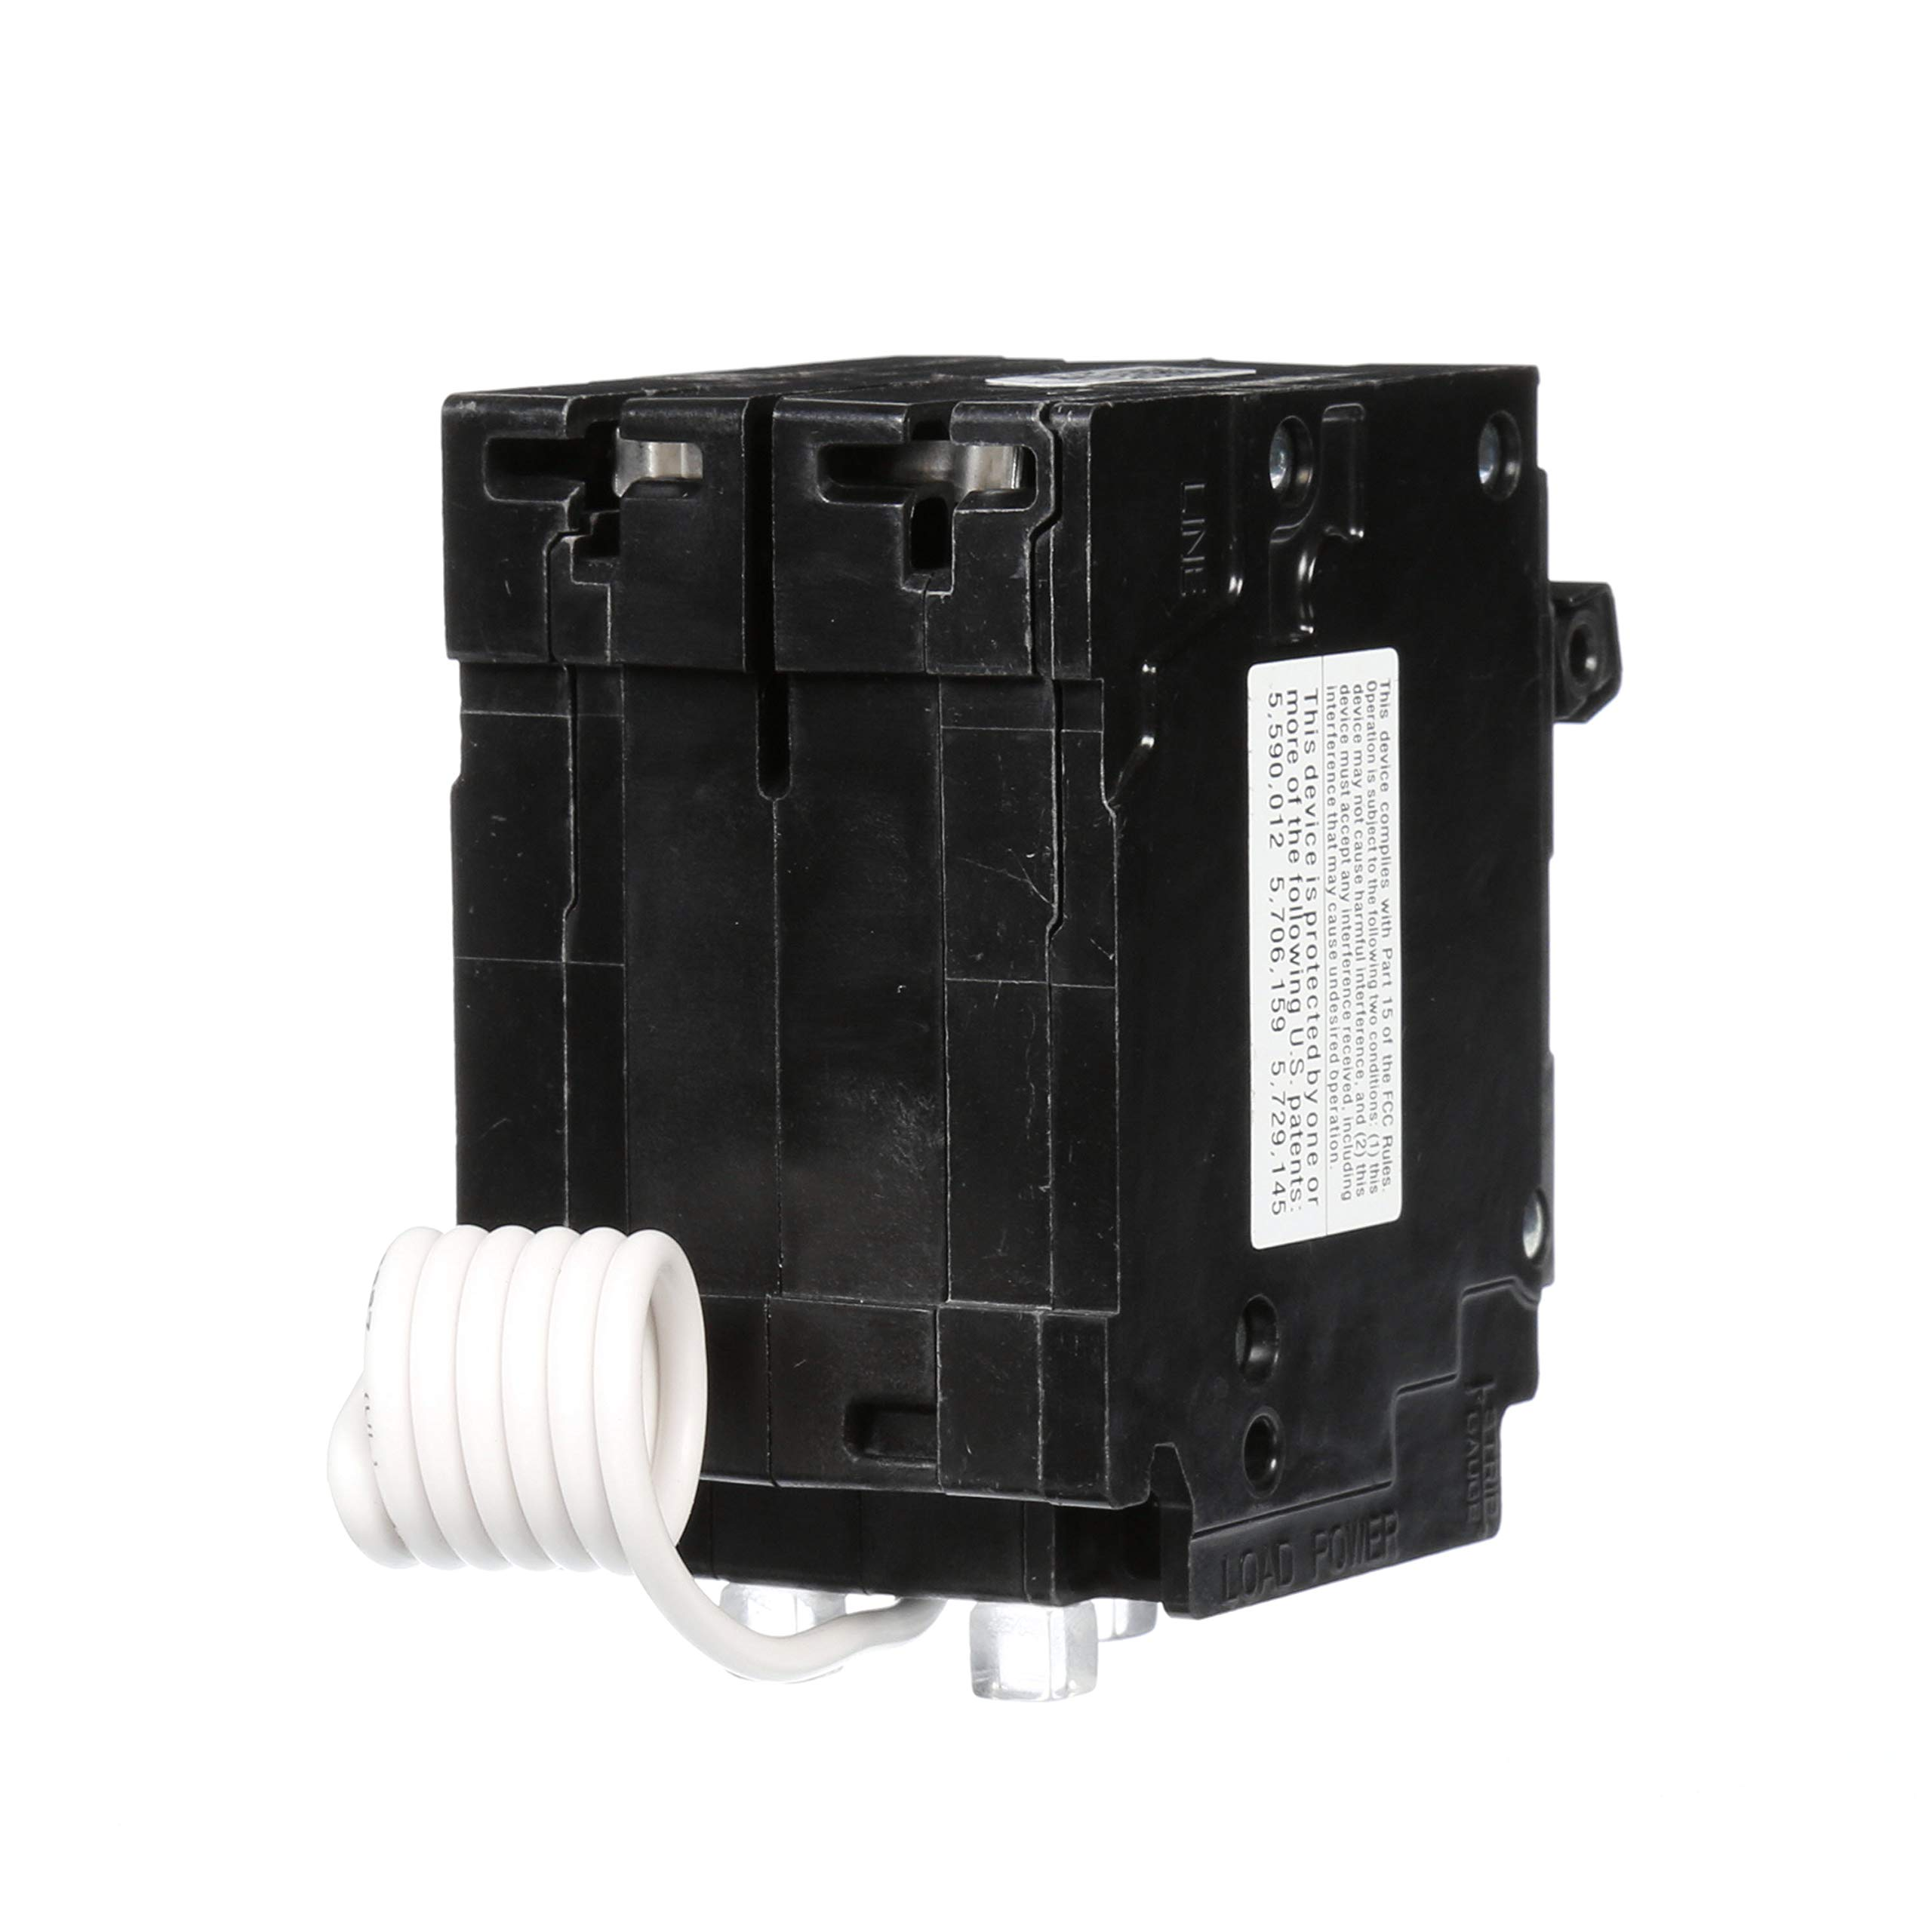 Siemens Q215AFCP 2-Pole 120-Volt combination type arc fault circuit interrupter by SIEMENS (Image #4)